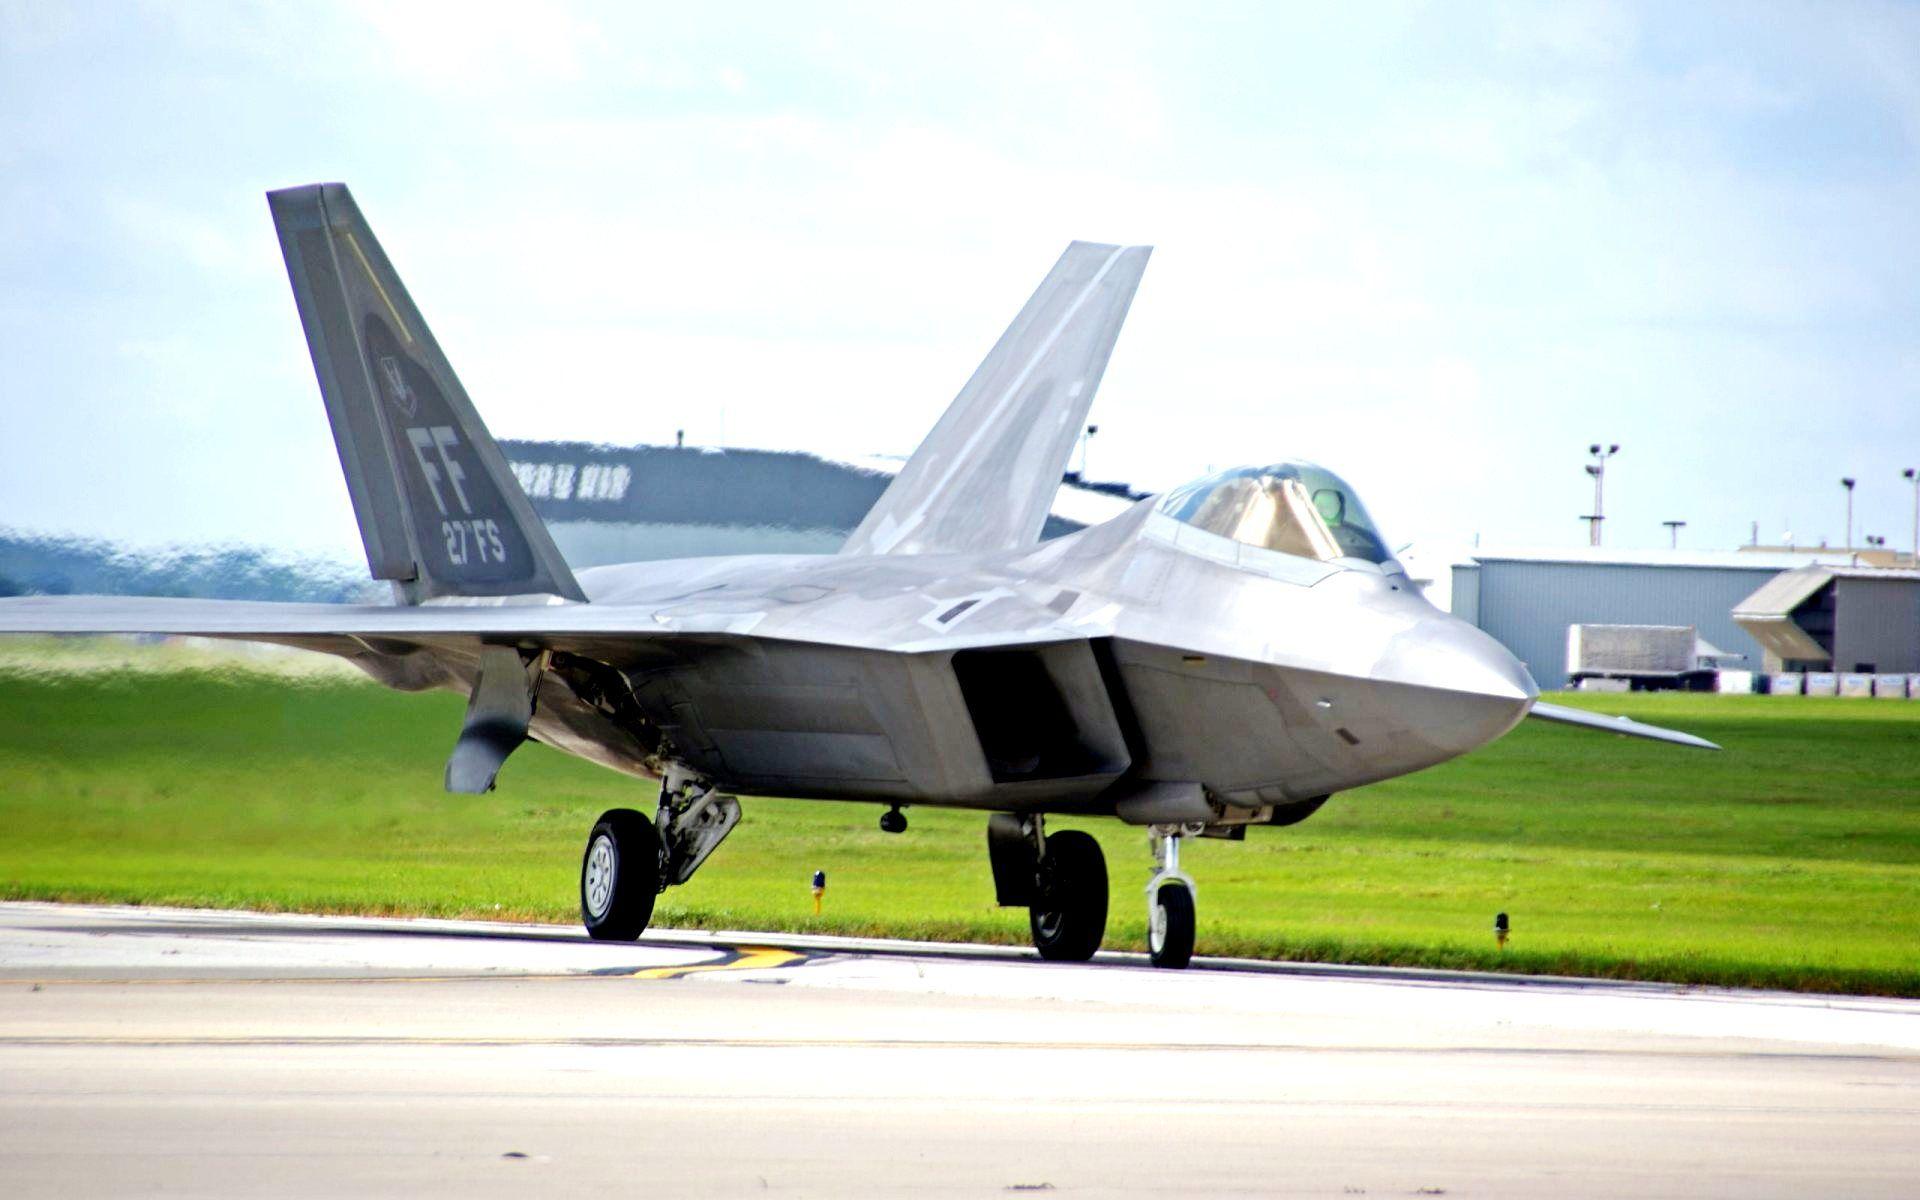 F22 Raptor Jets Hd Wallpaper Raptor Aircraft Hd Wallpaper